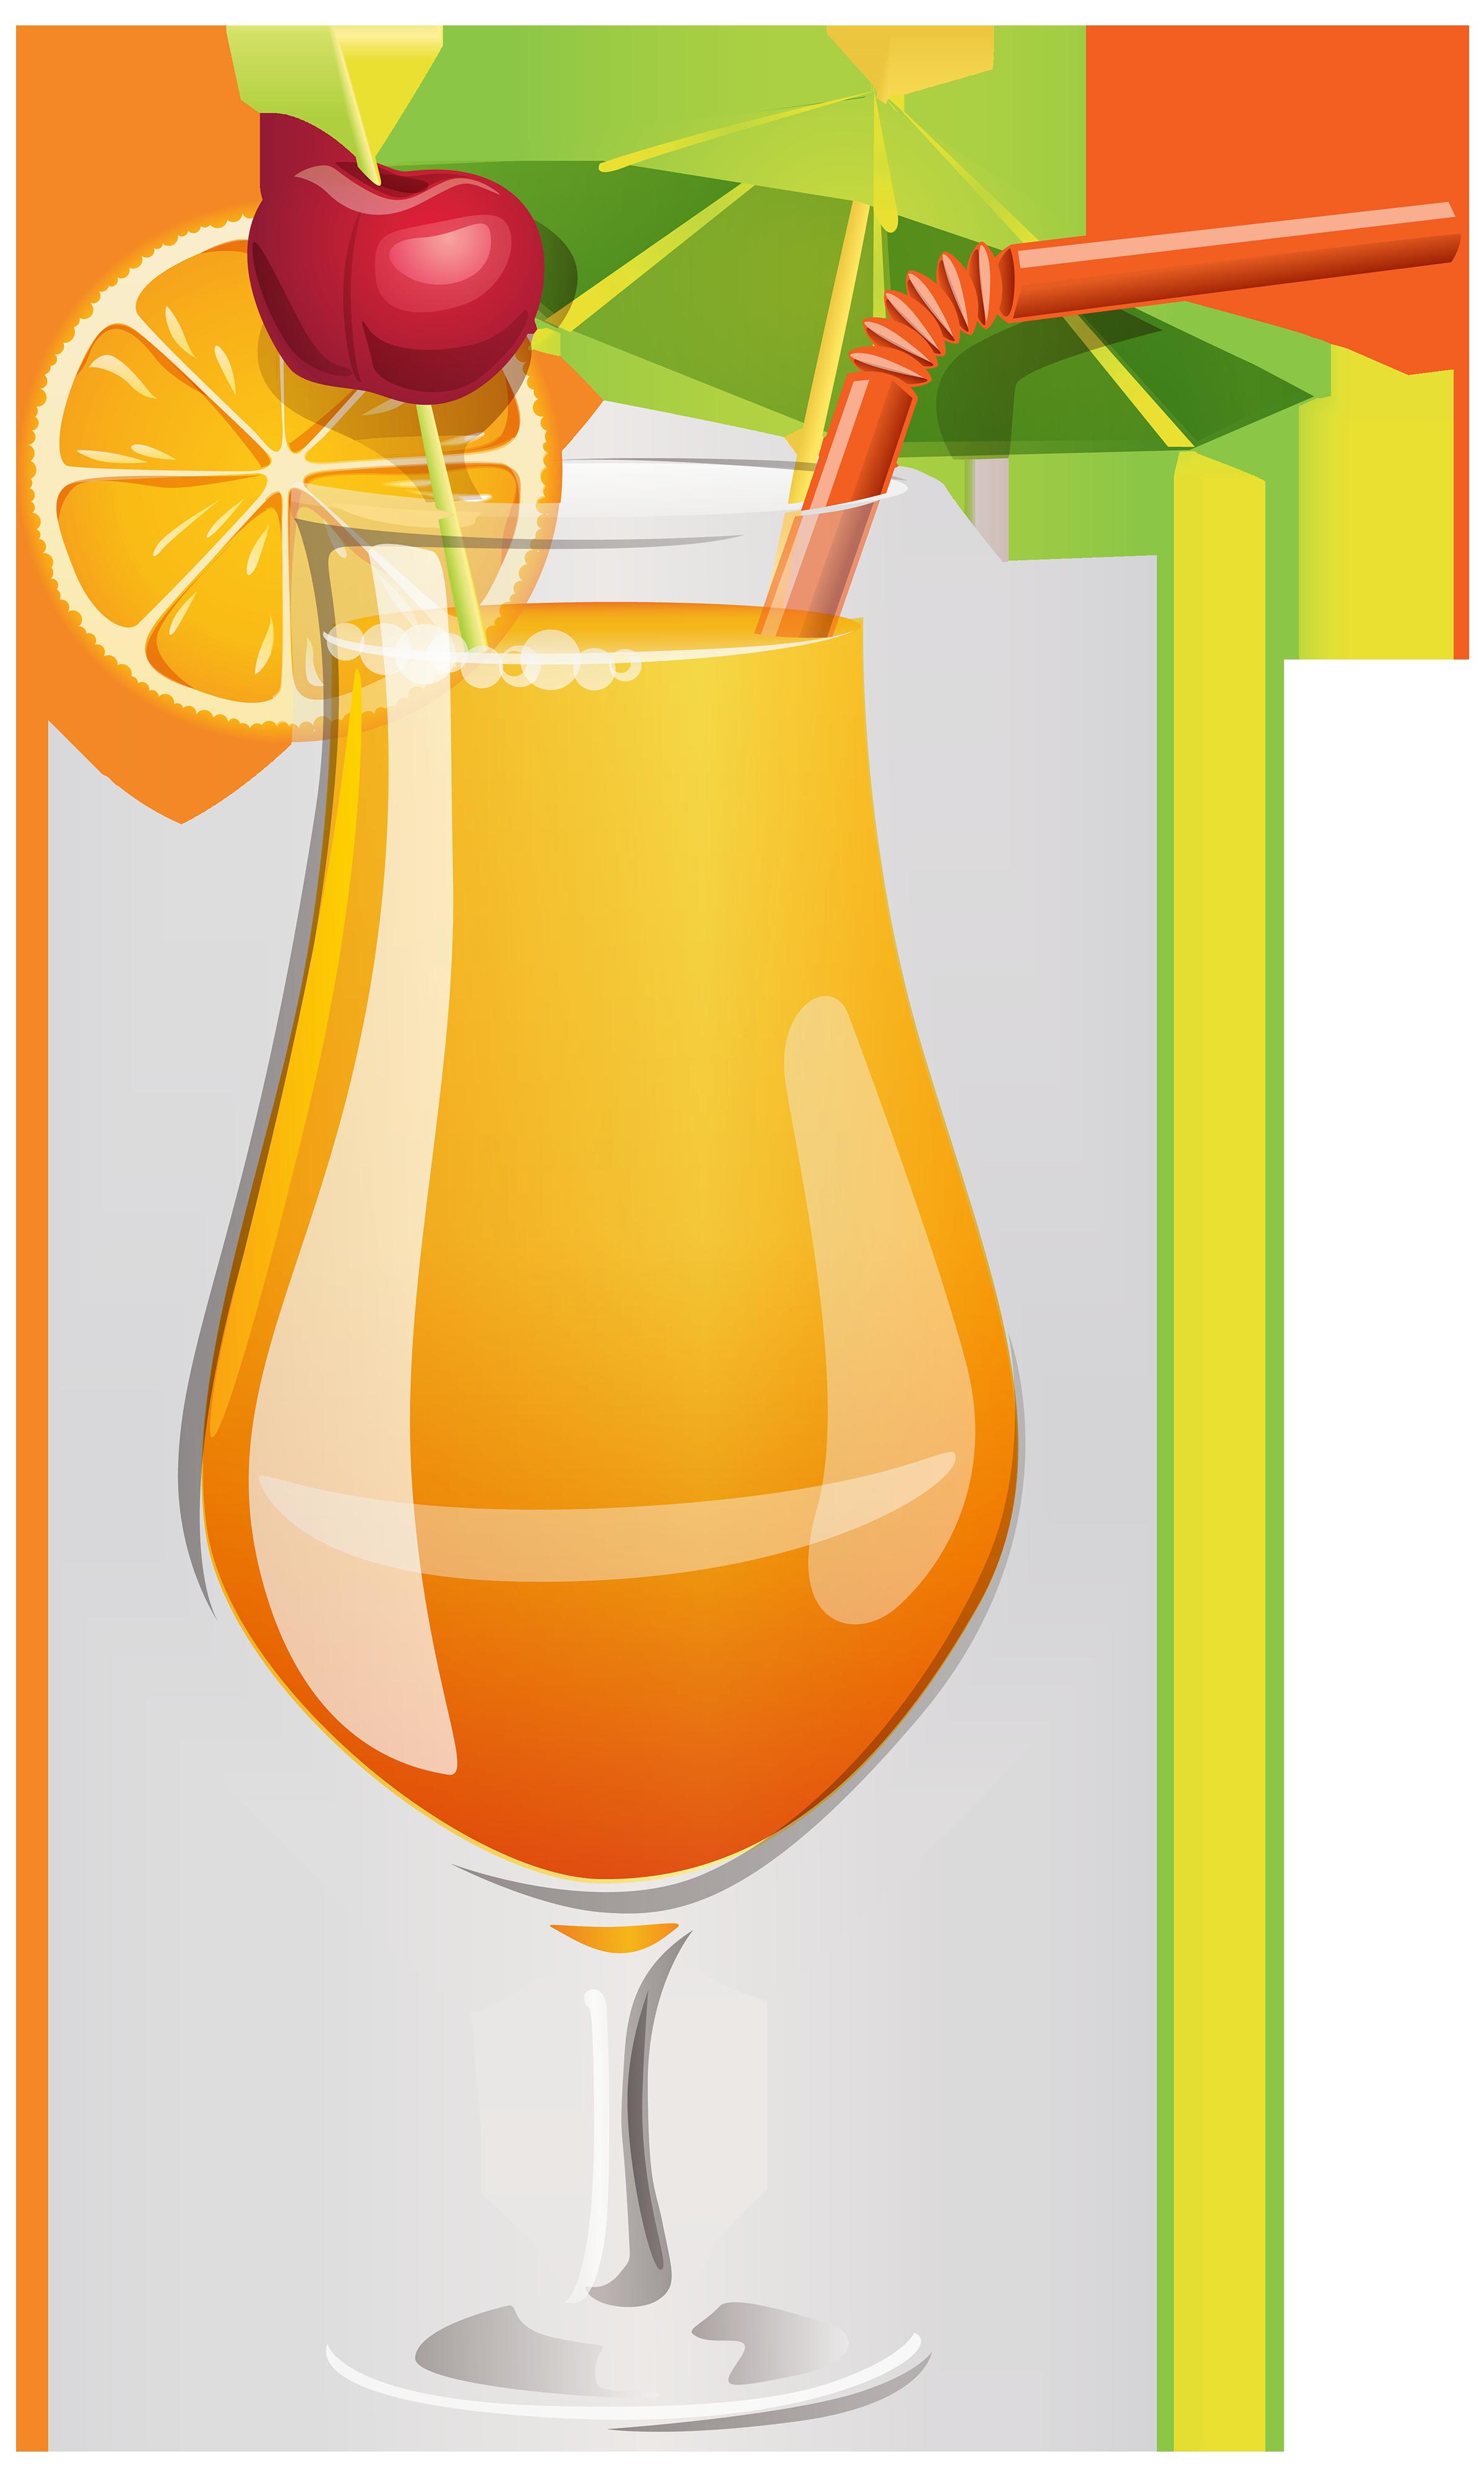 Pumpkin drinking clipart image free stock Pin by Катя on ❅ Clipart ❅ (Клипарт) | Pinterest image free stock